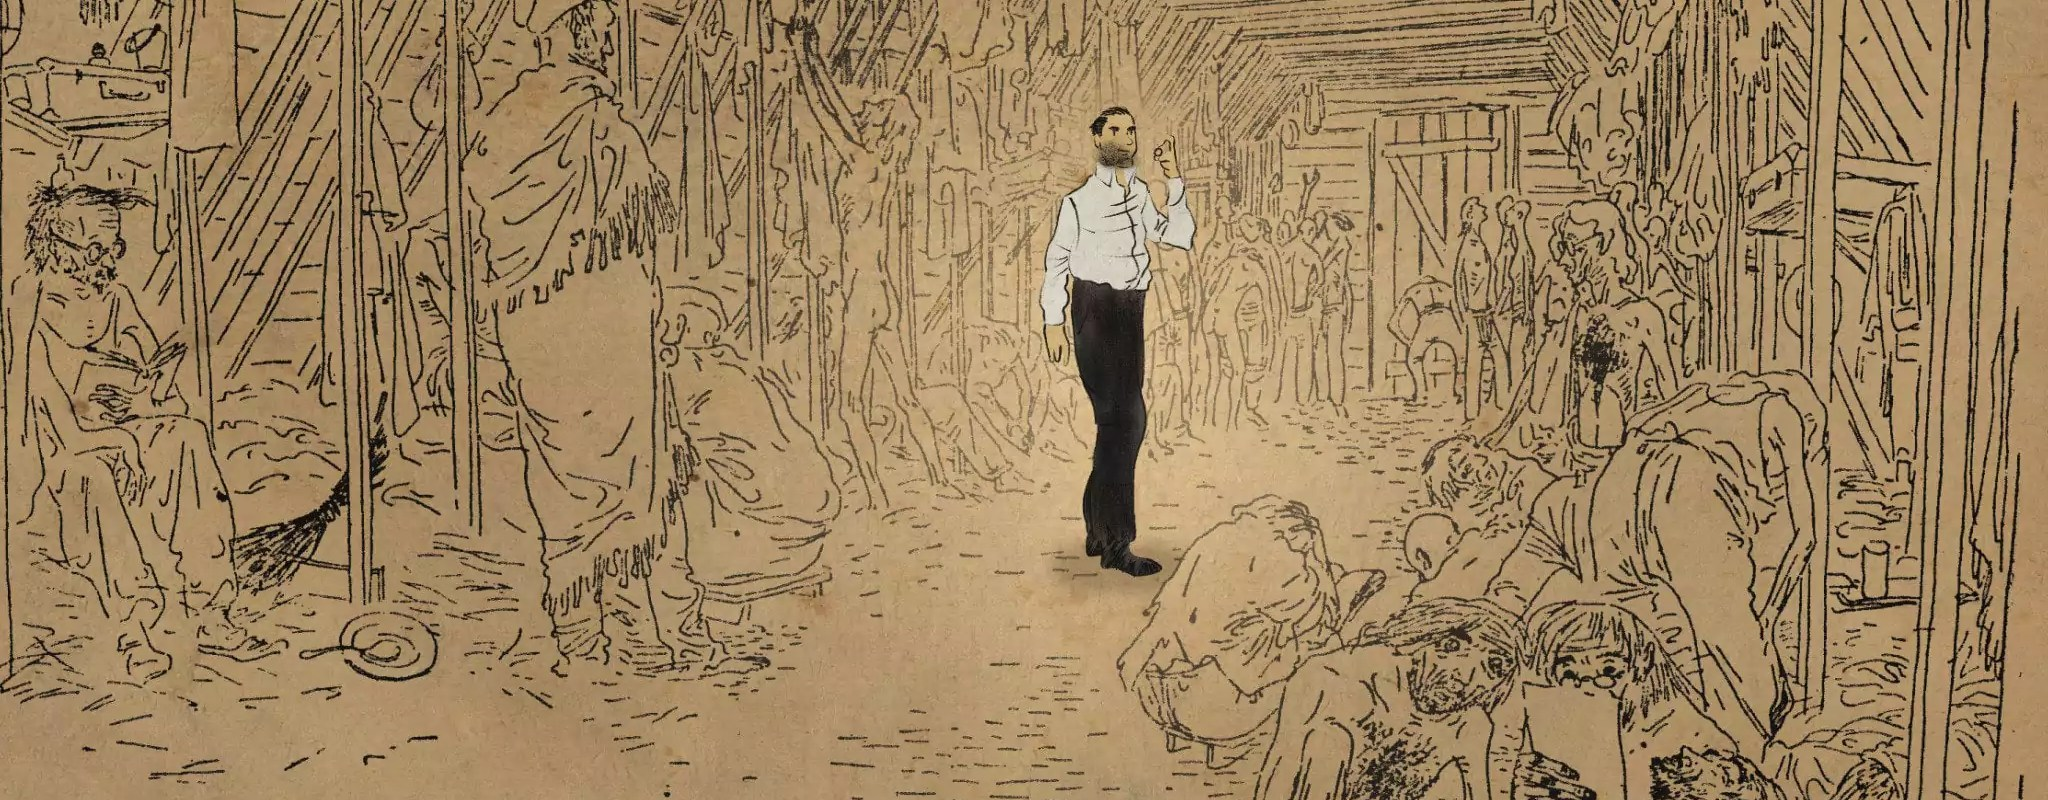 «Josep», un film d'animation contre l'oubli de la Retirada